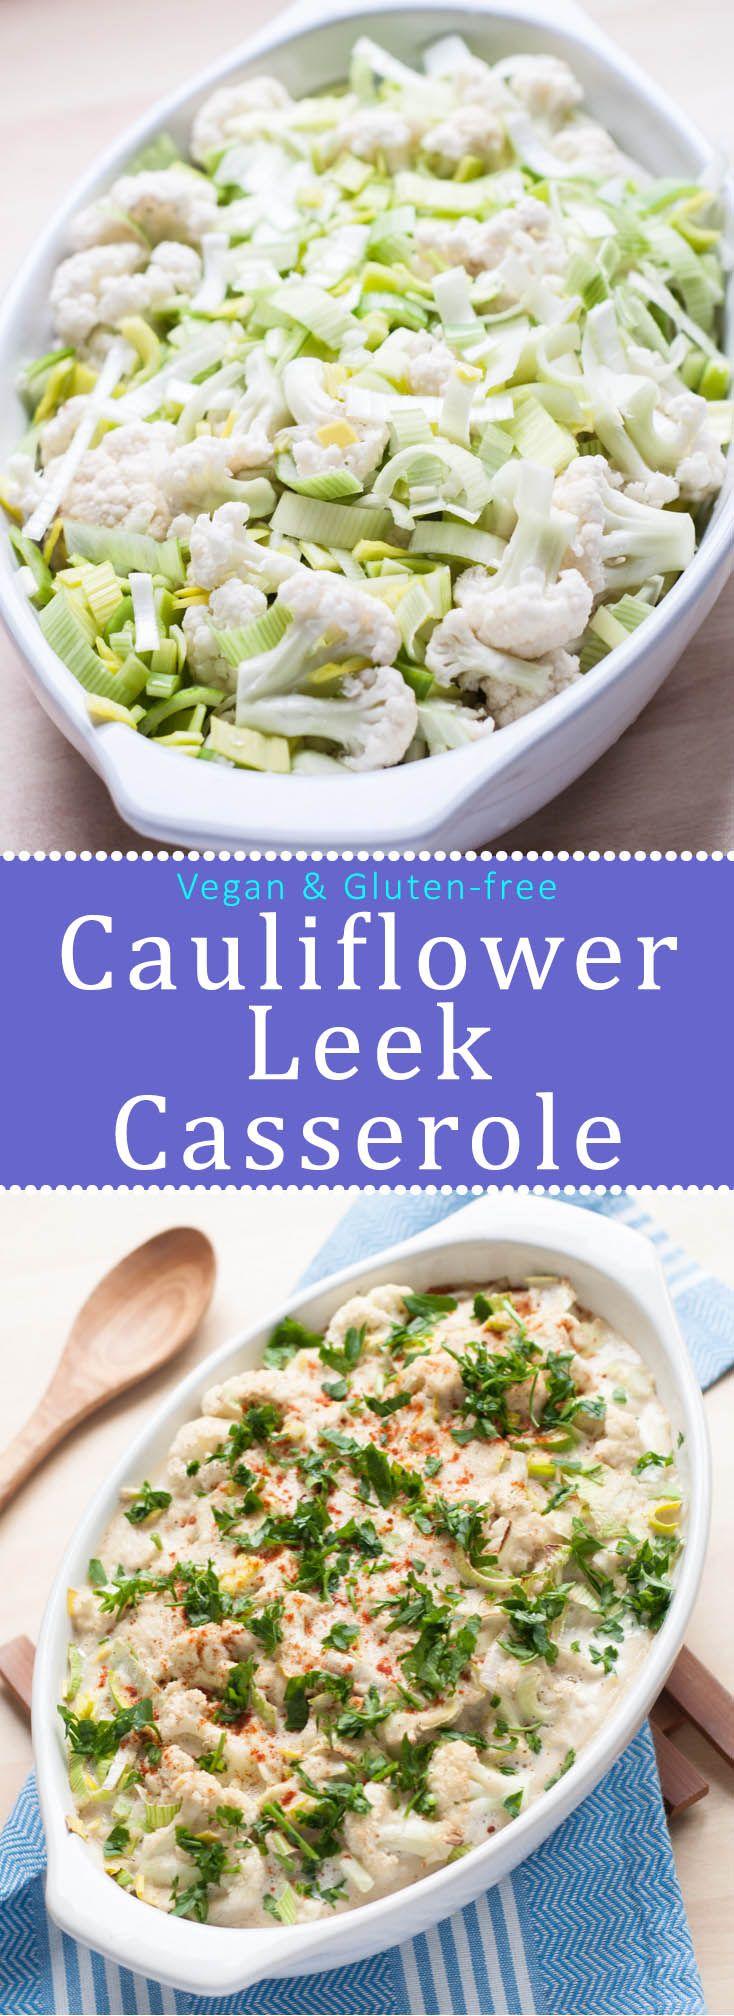 Gluten-free & Vegan Cauliflower Leek Casserole is the perfect vegan comfort food.Rich, creamy and very easy to make. | VeganFamilyRecipes.com | #dinner #dairyfree